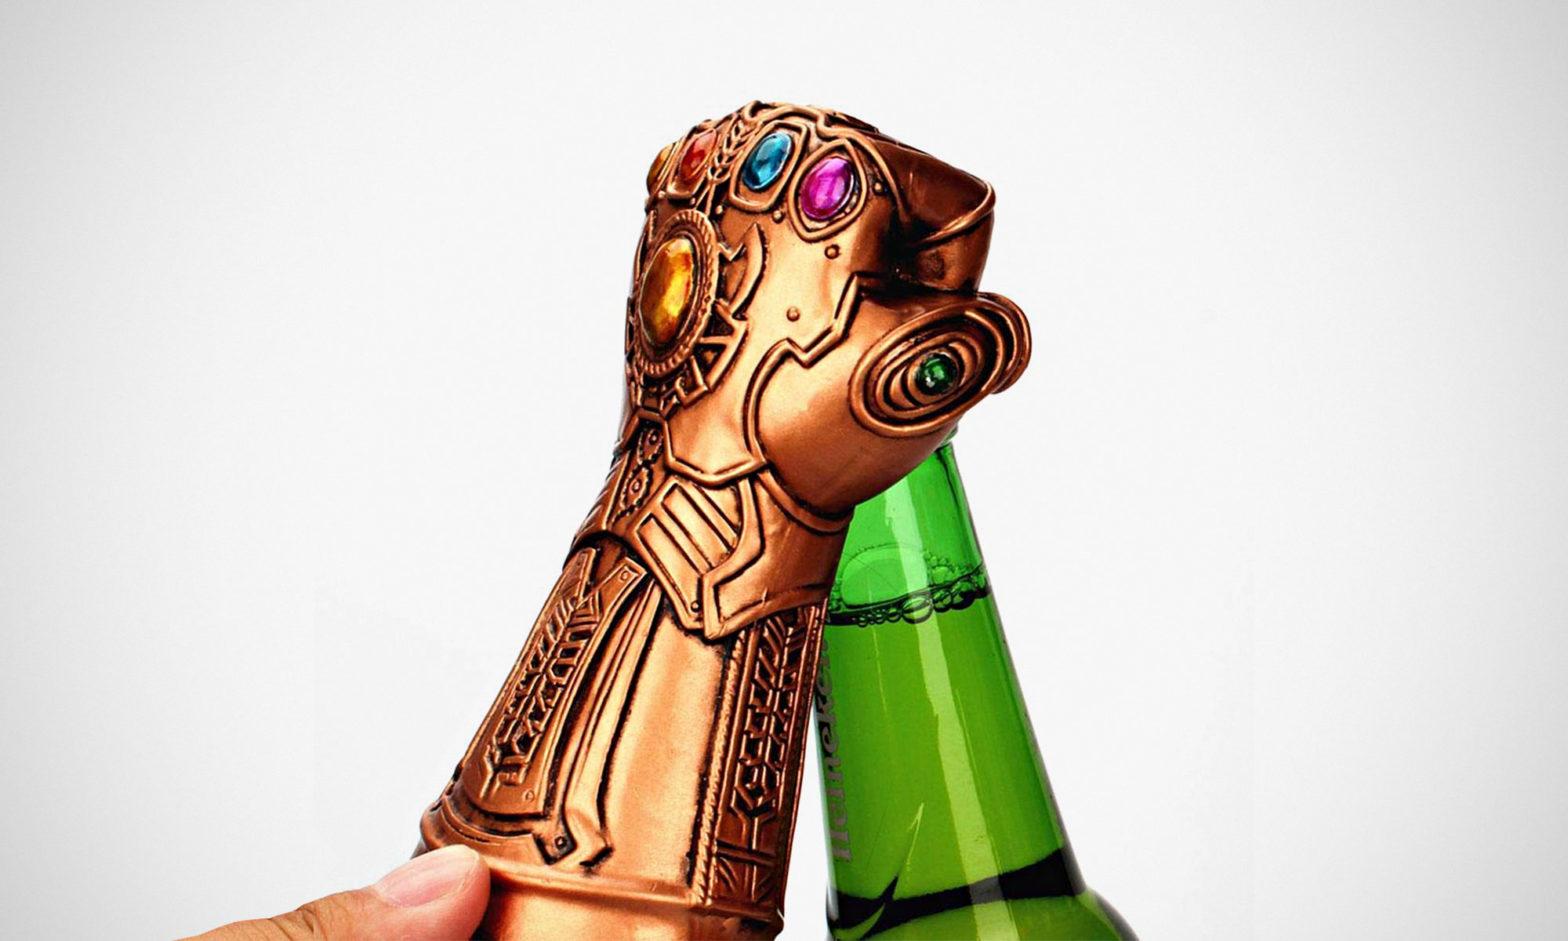 Thanos Infinity Gauntlet Bottle Opener